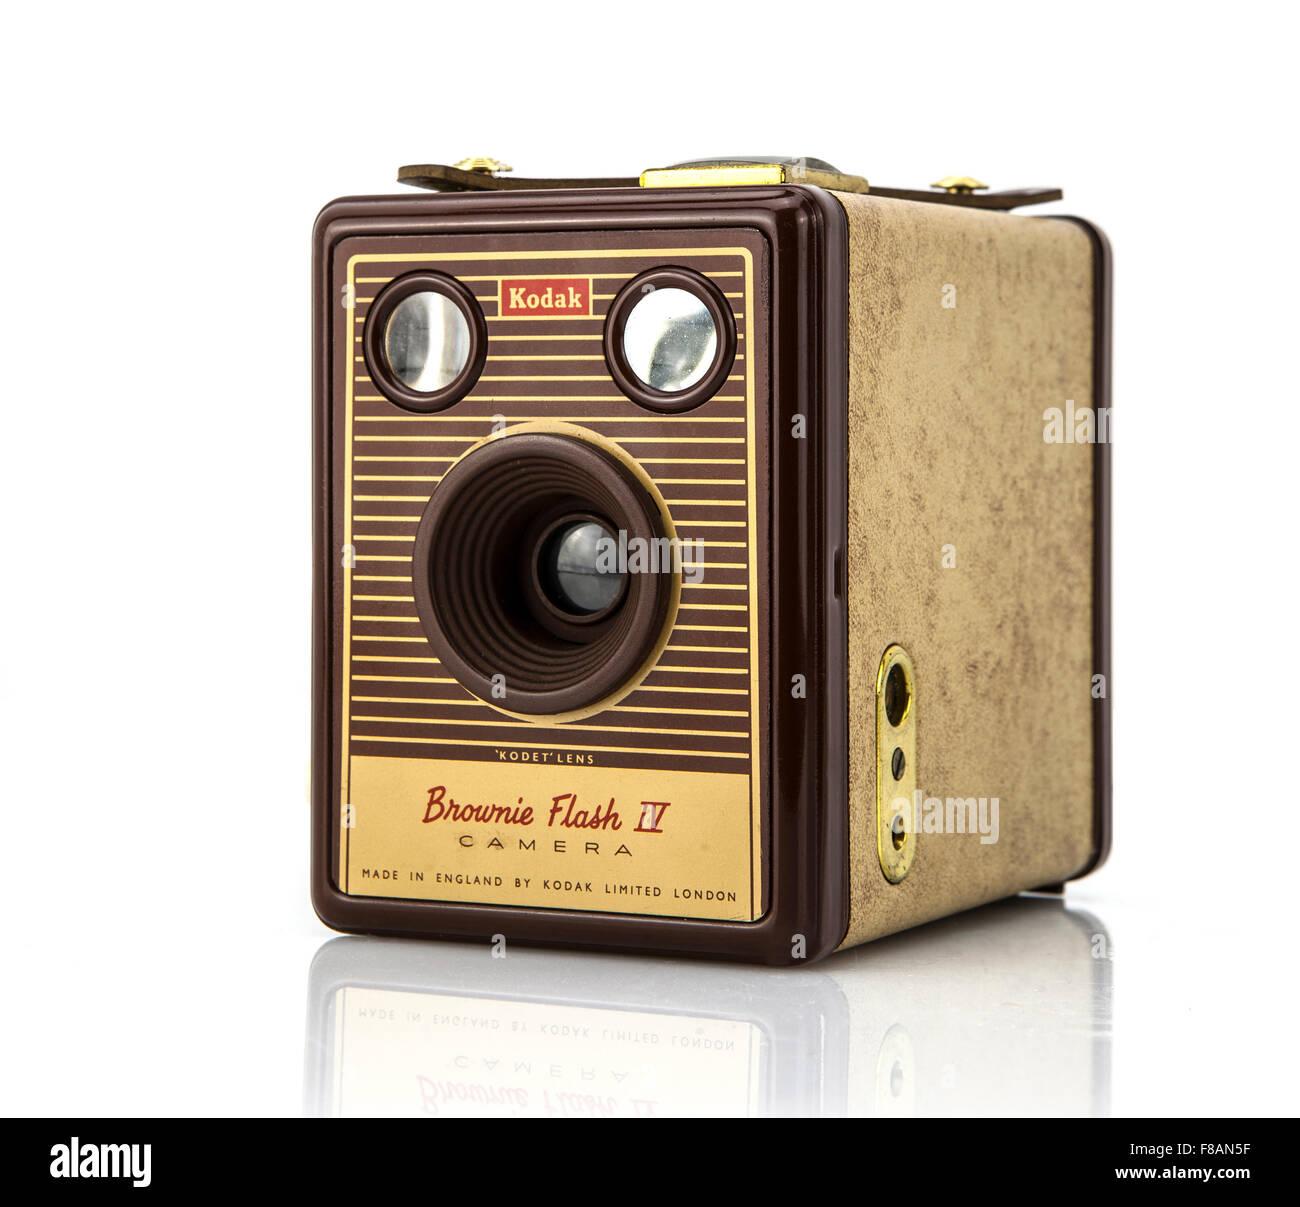 Kodak Brownie flash IV (1957) shot in studio on a white background - Stock Image